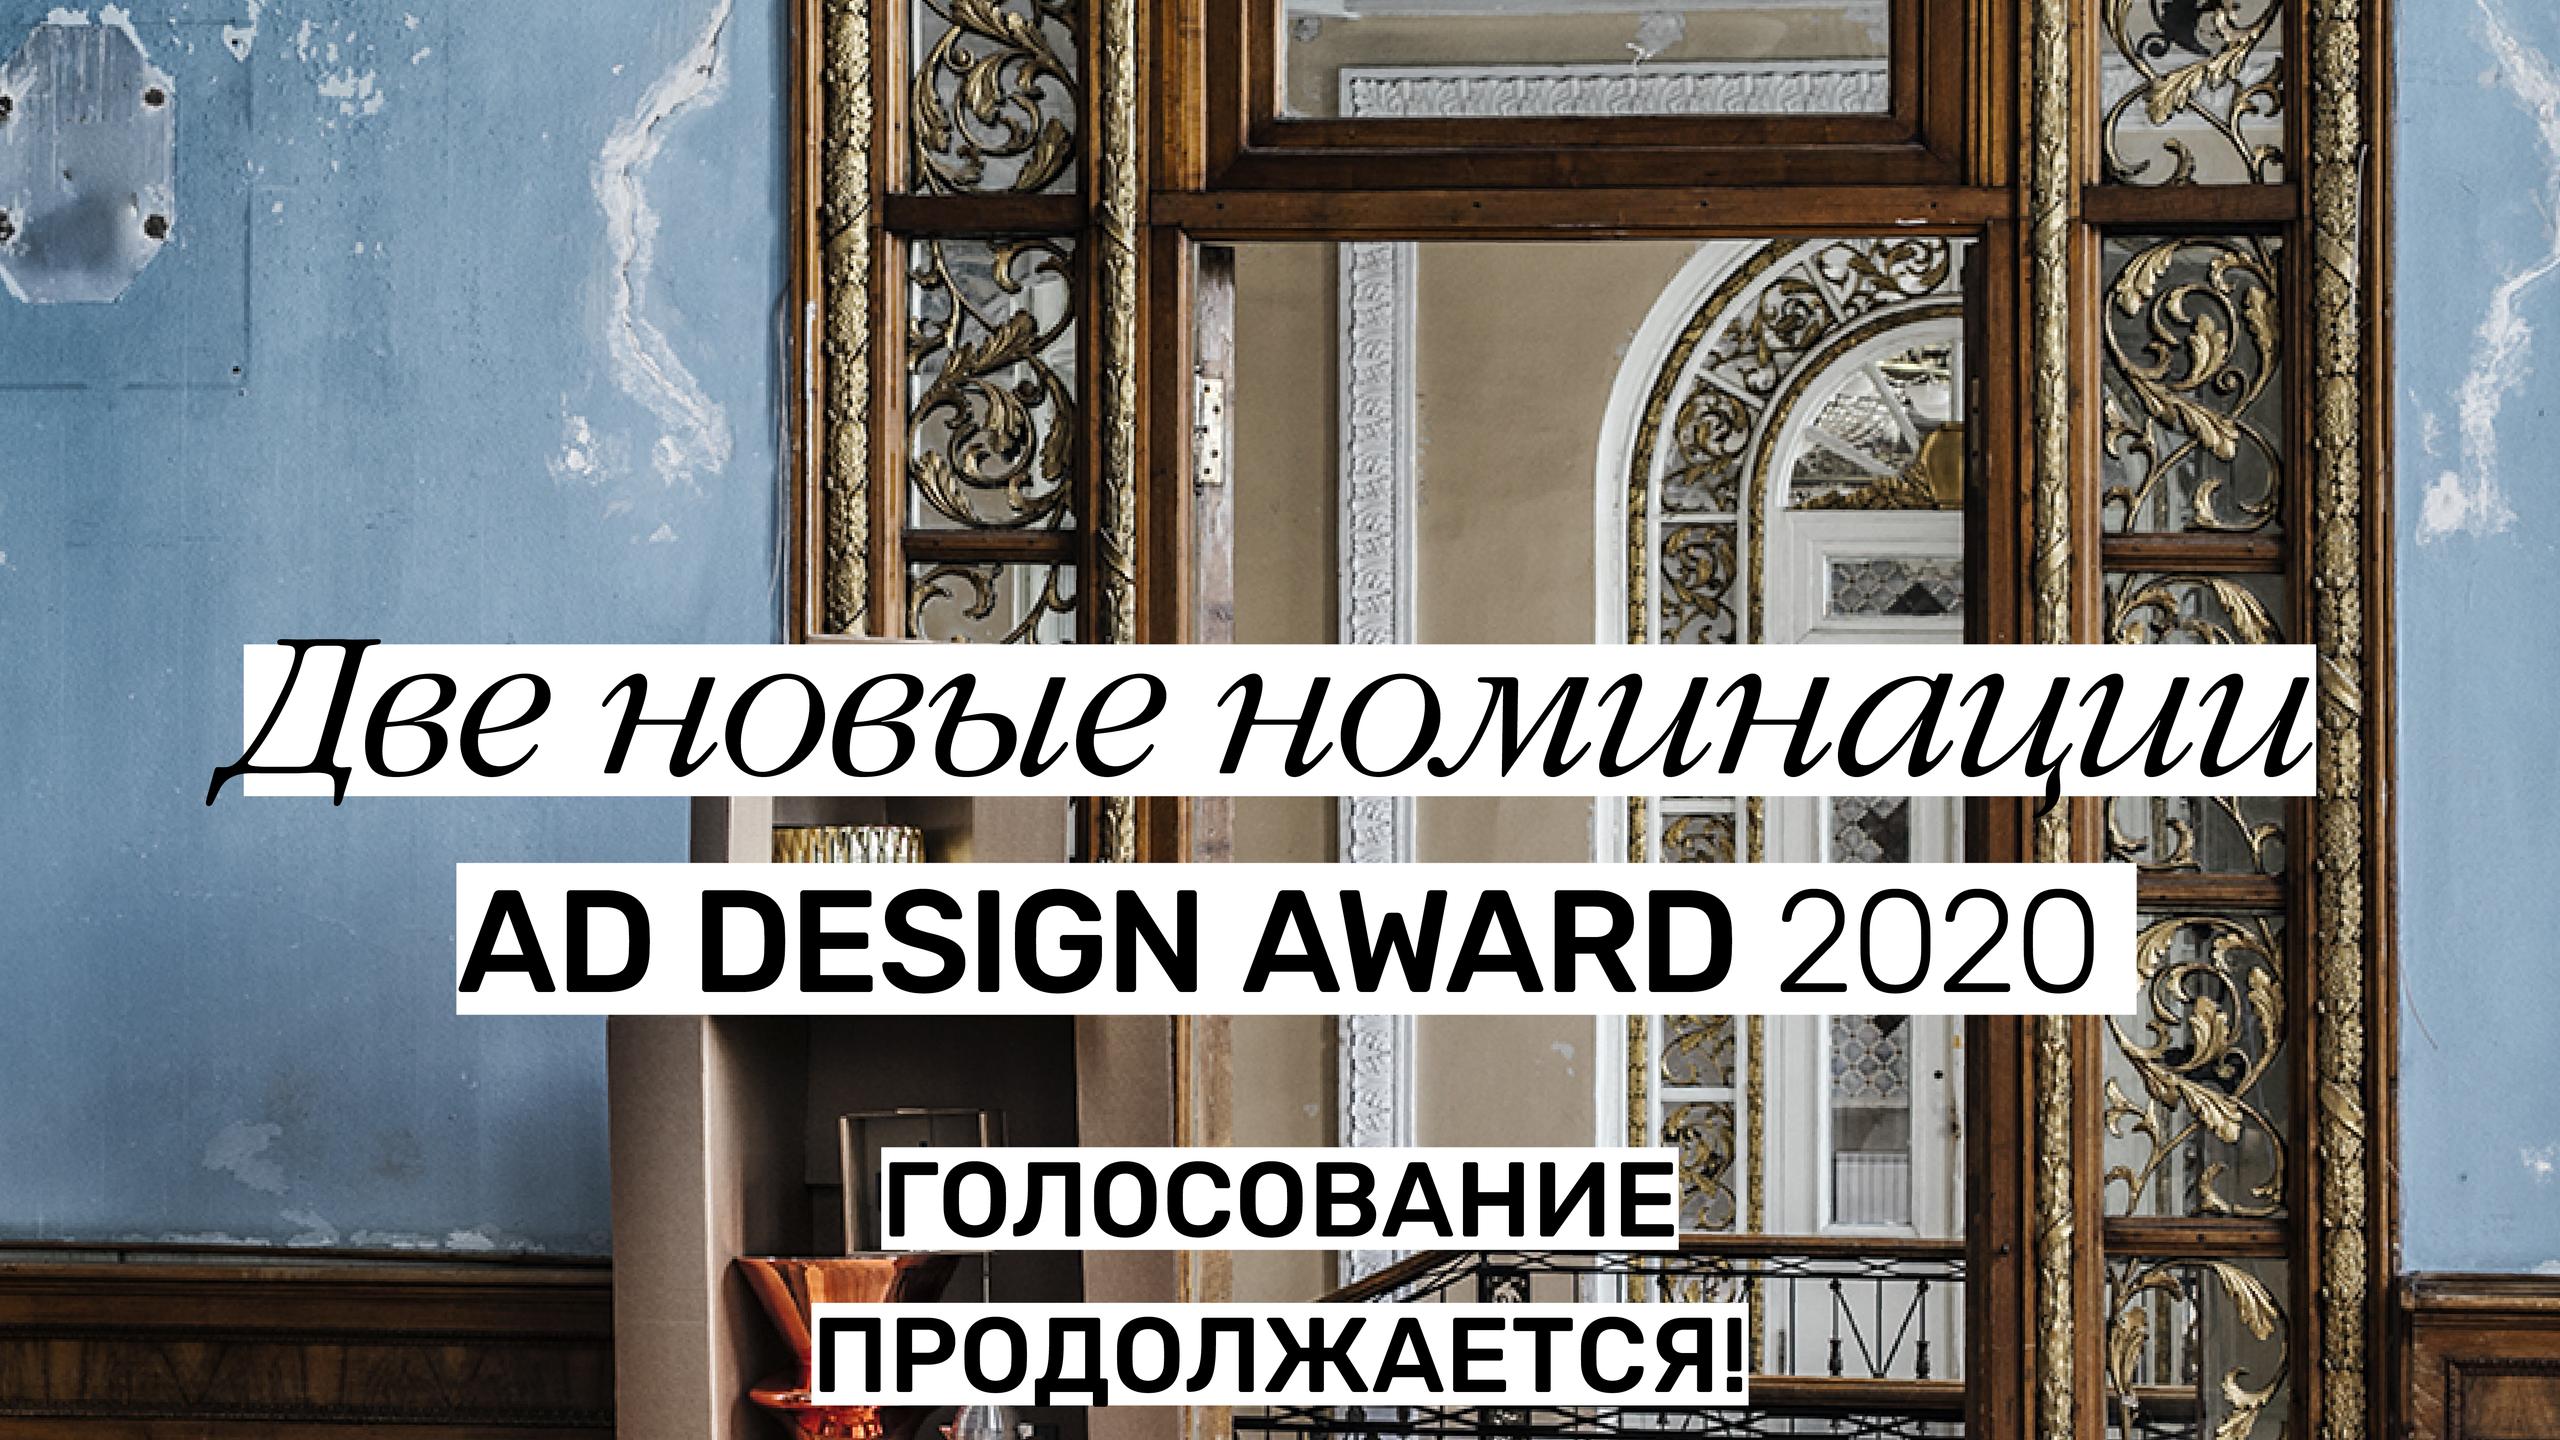 AD Design Award 2020